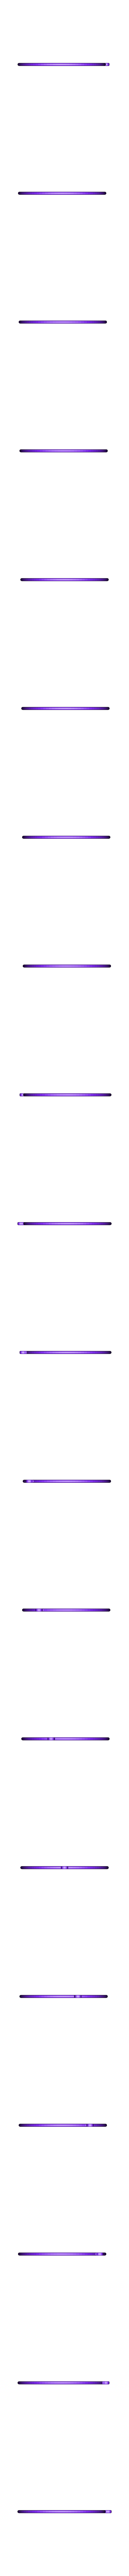 deer.stl Download free STL file GYRO ORNAMENT – DEER • 3D printable object, Glamarune